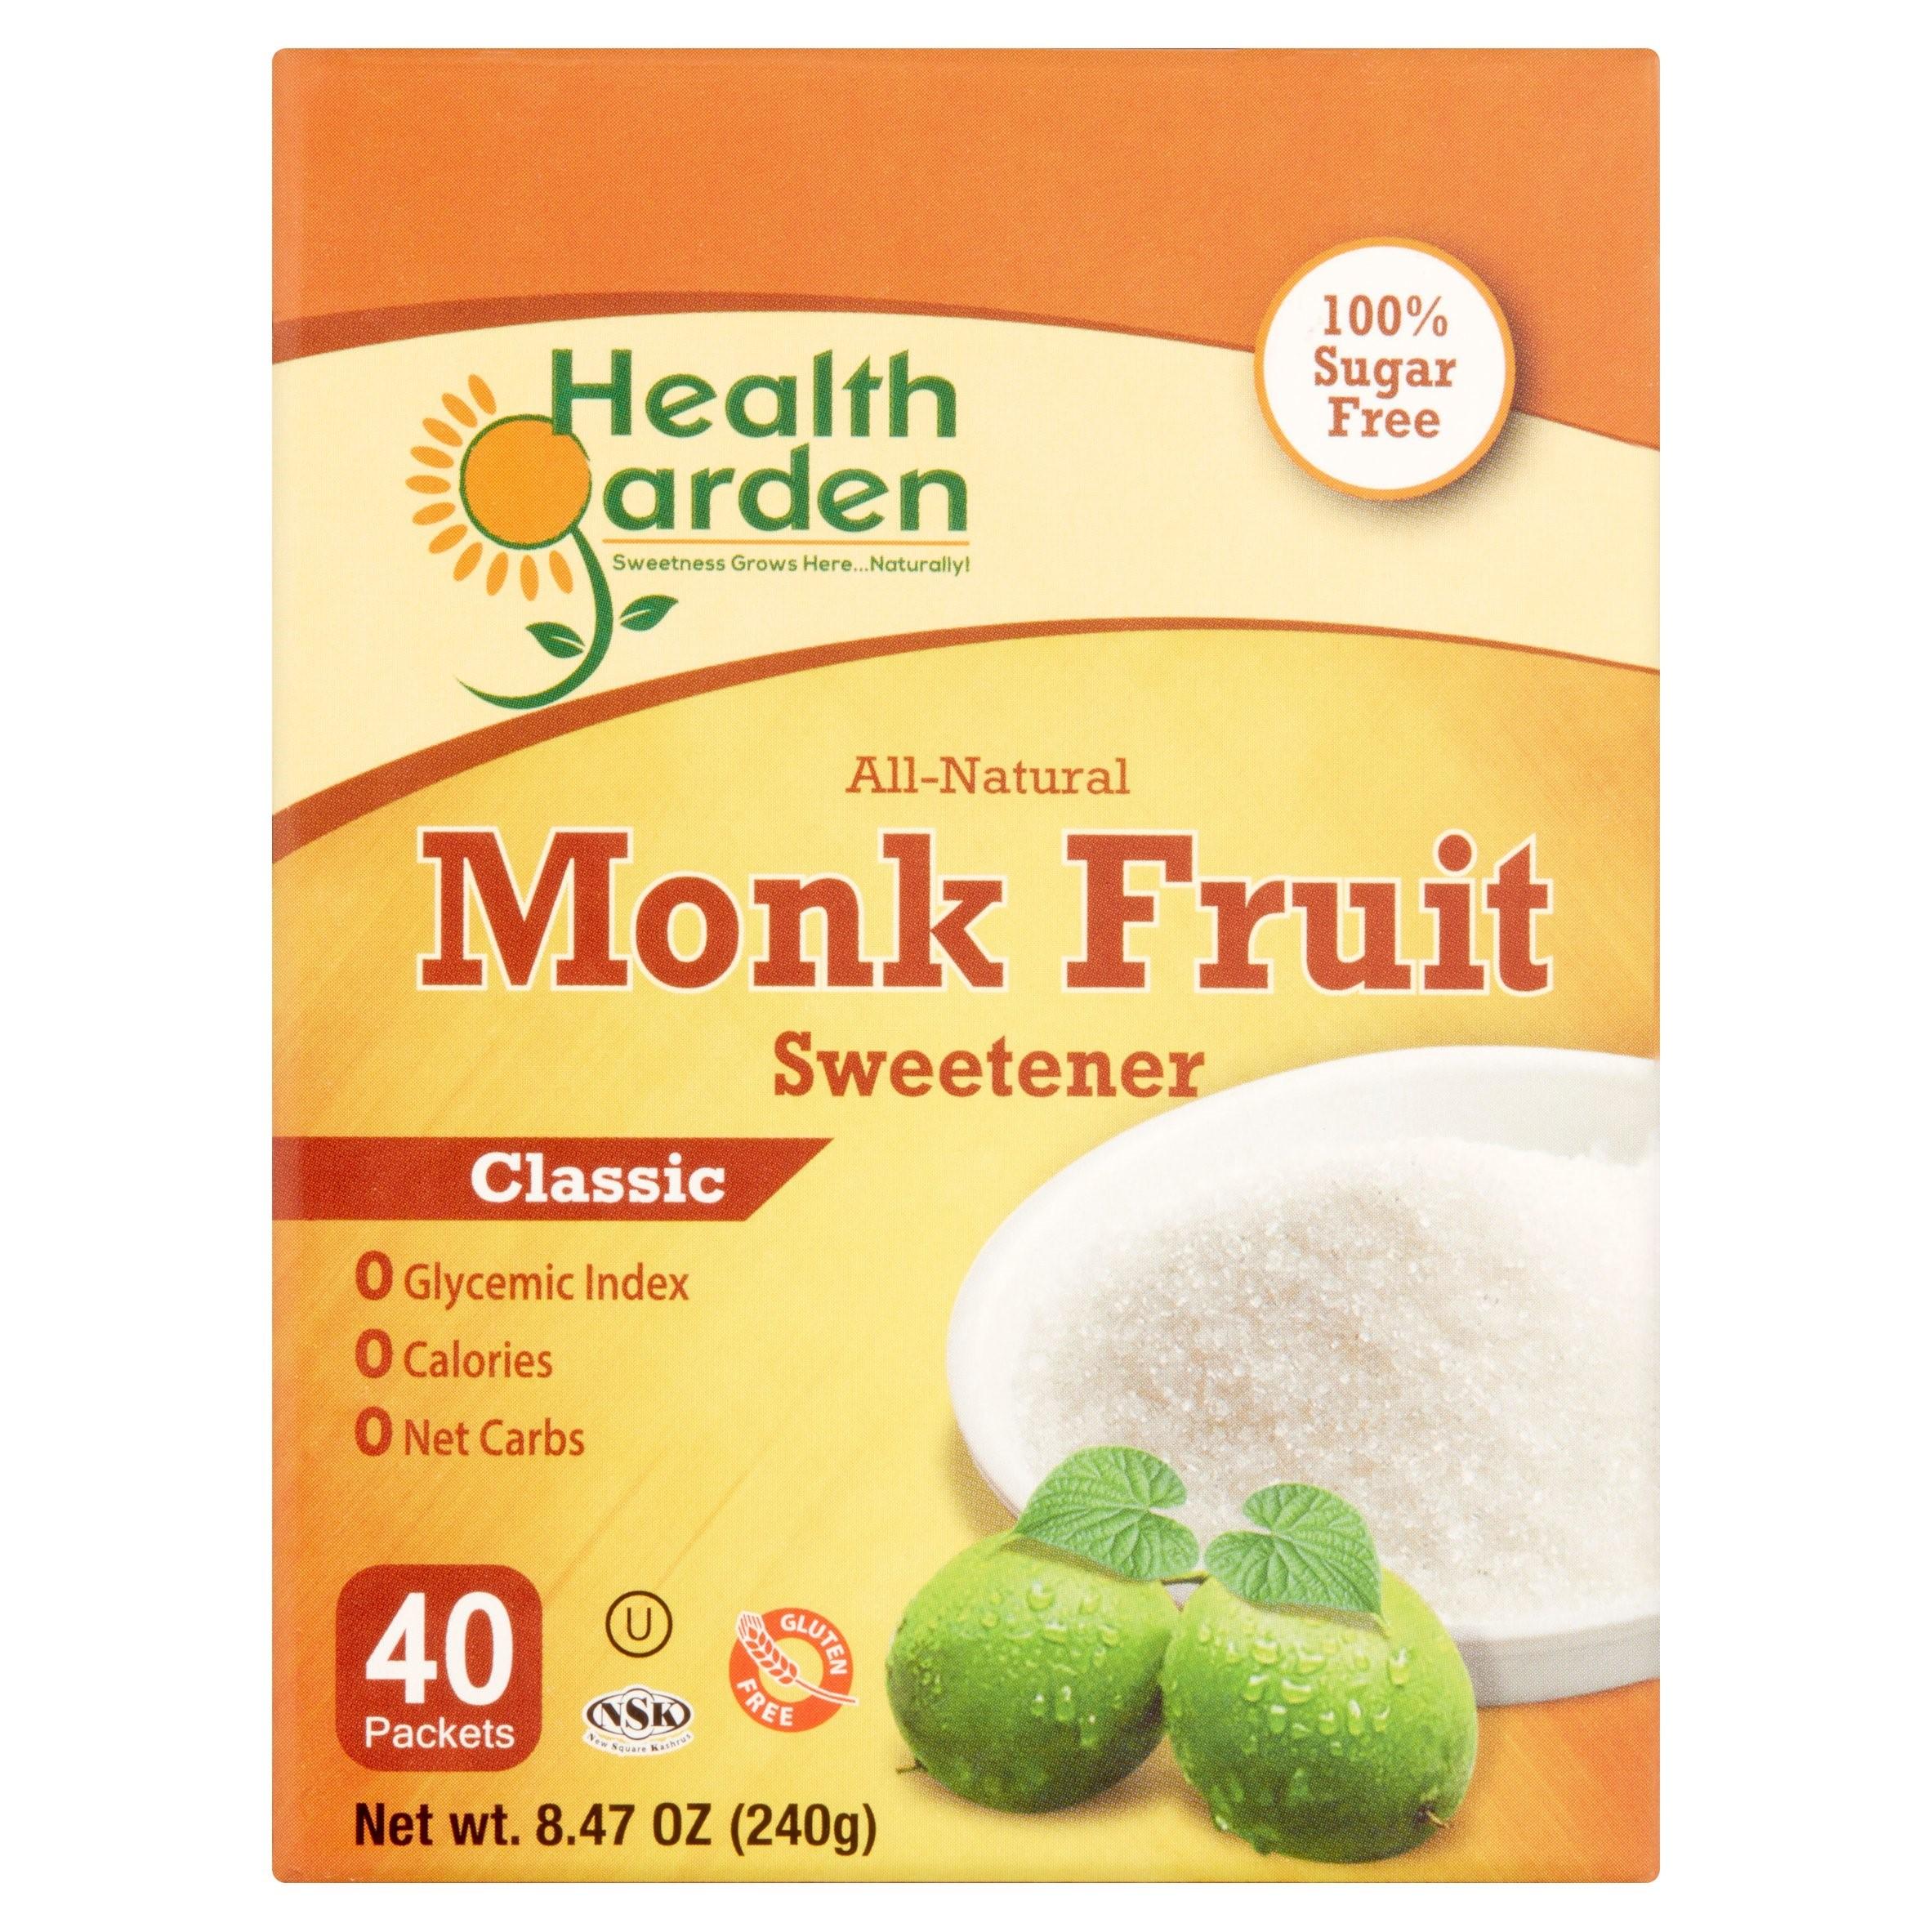 Health Garden Classic All-Natural Monk Fruit Sweetener, 40 pack, 8.47 Oz